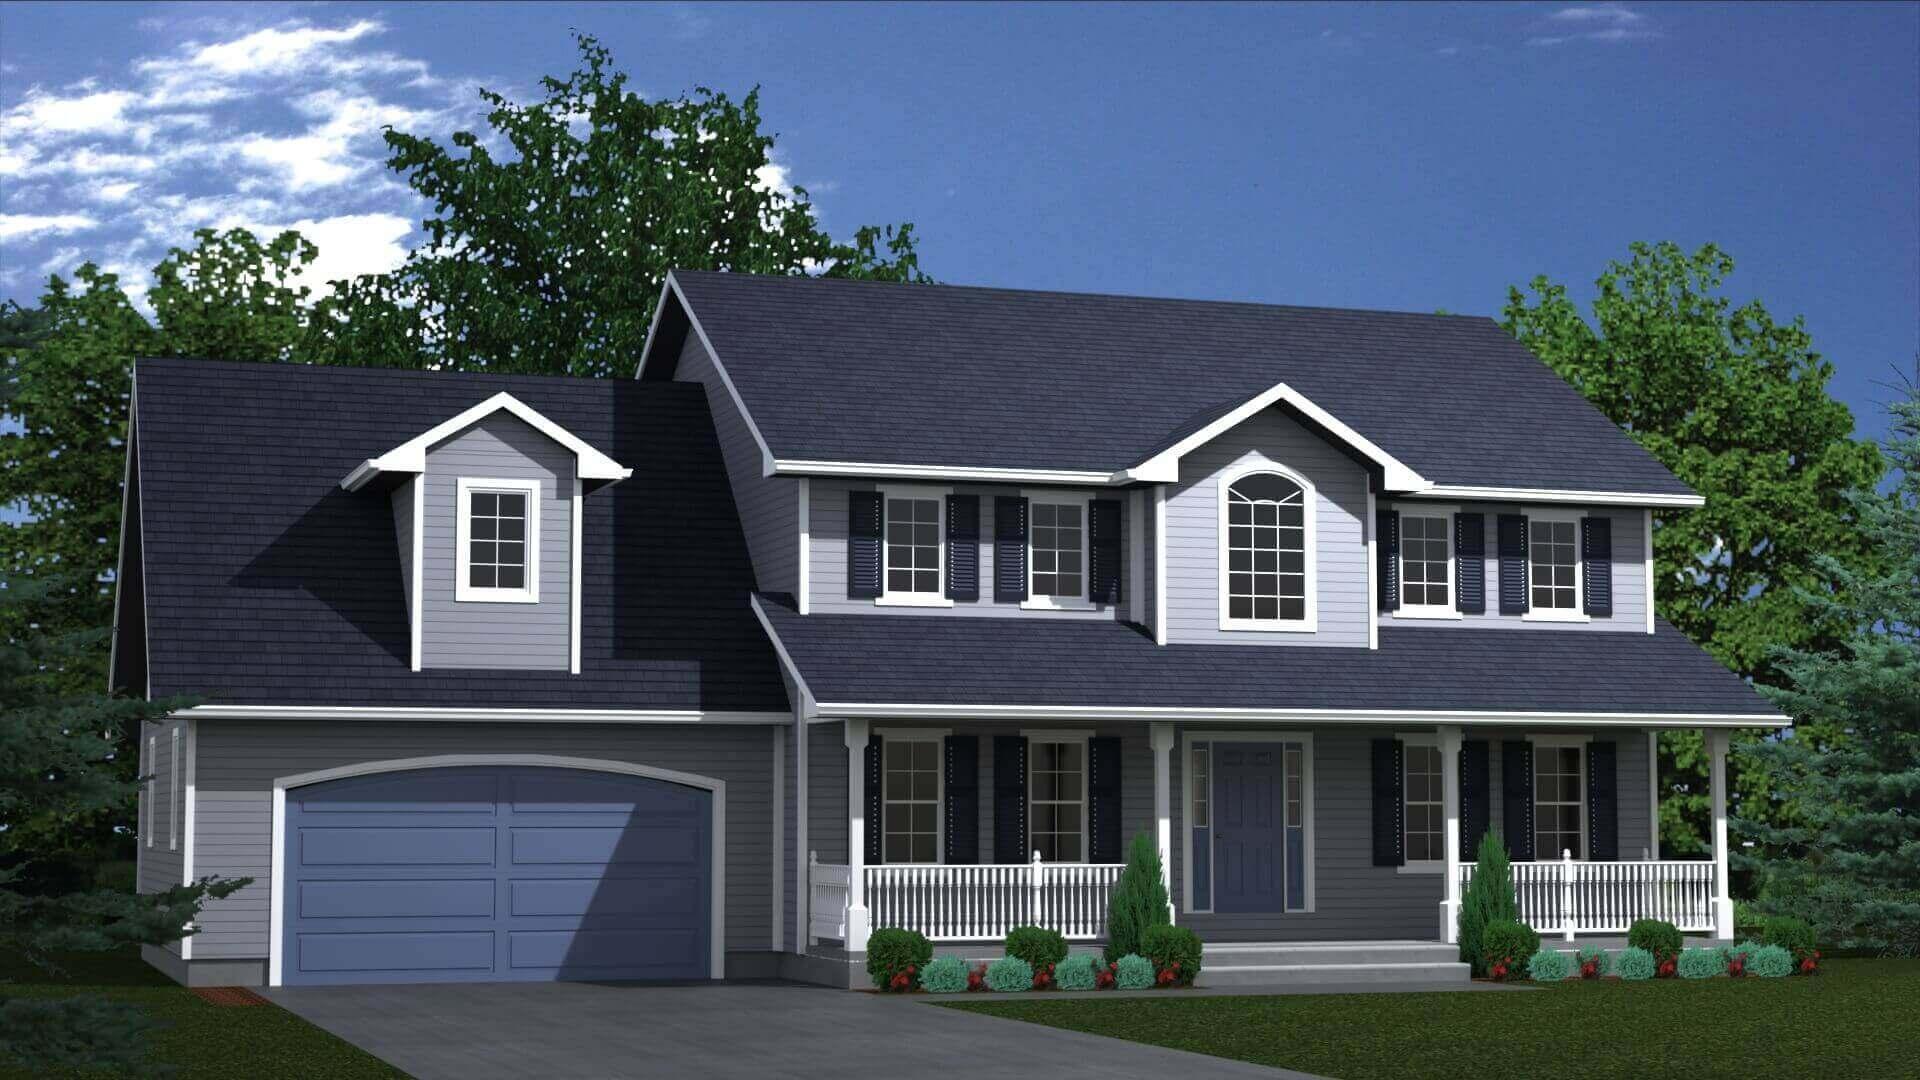 2204 house elevation